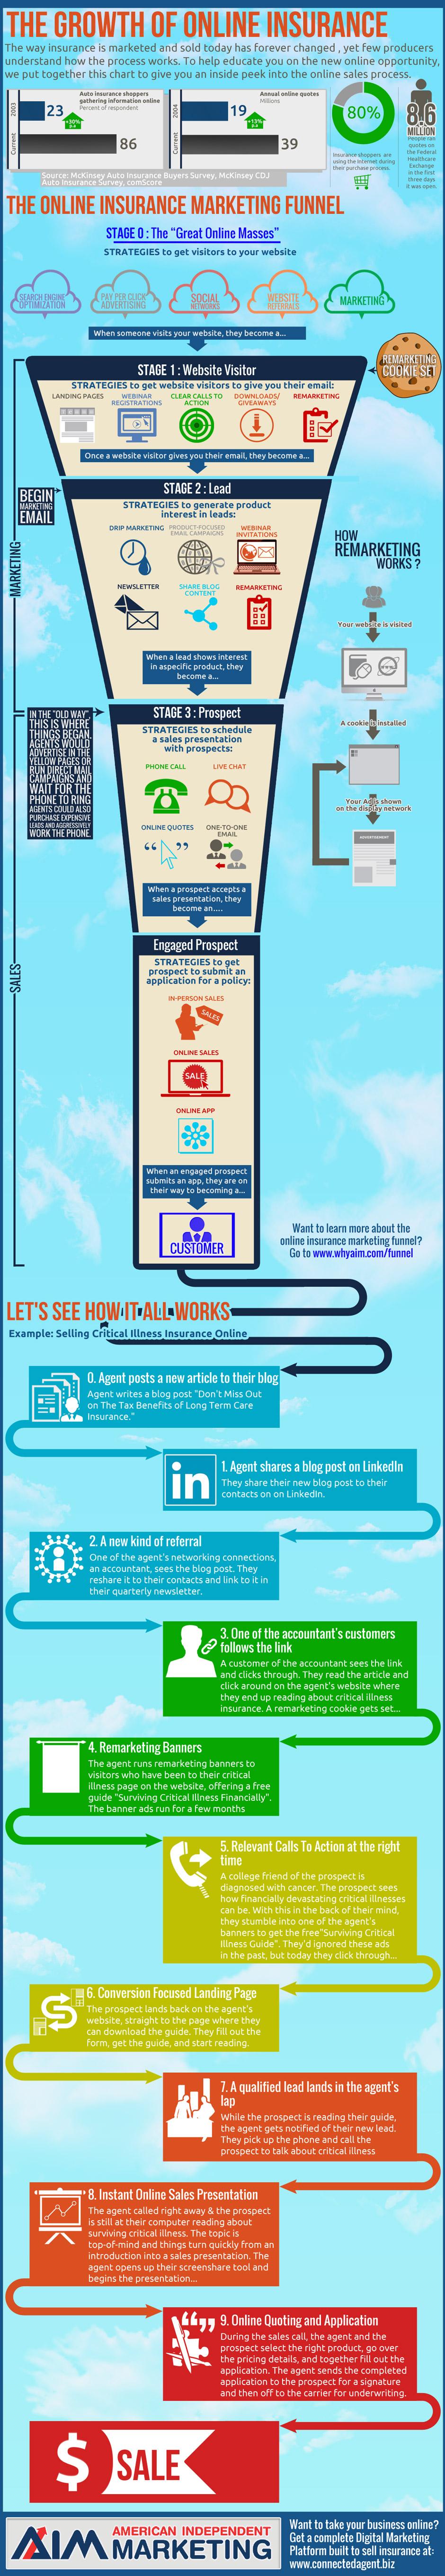 Infographic: Online Insurance Marketing Funnel